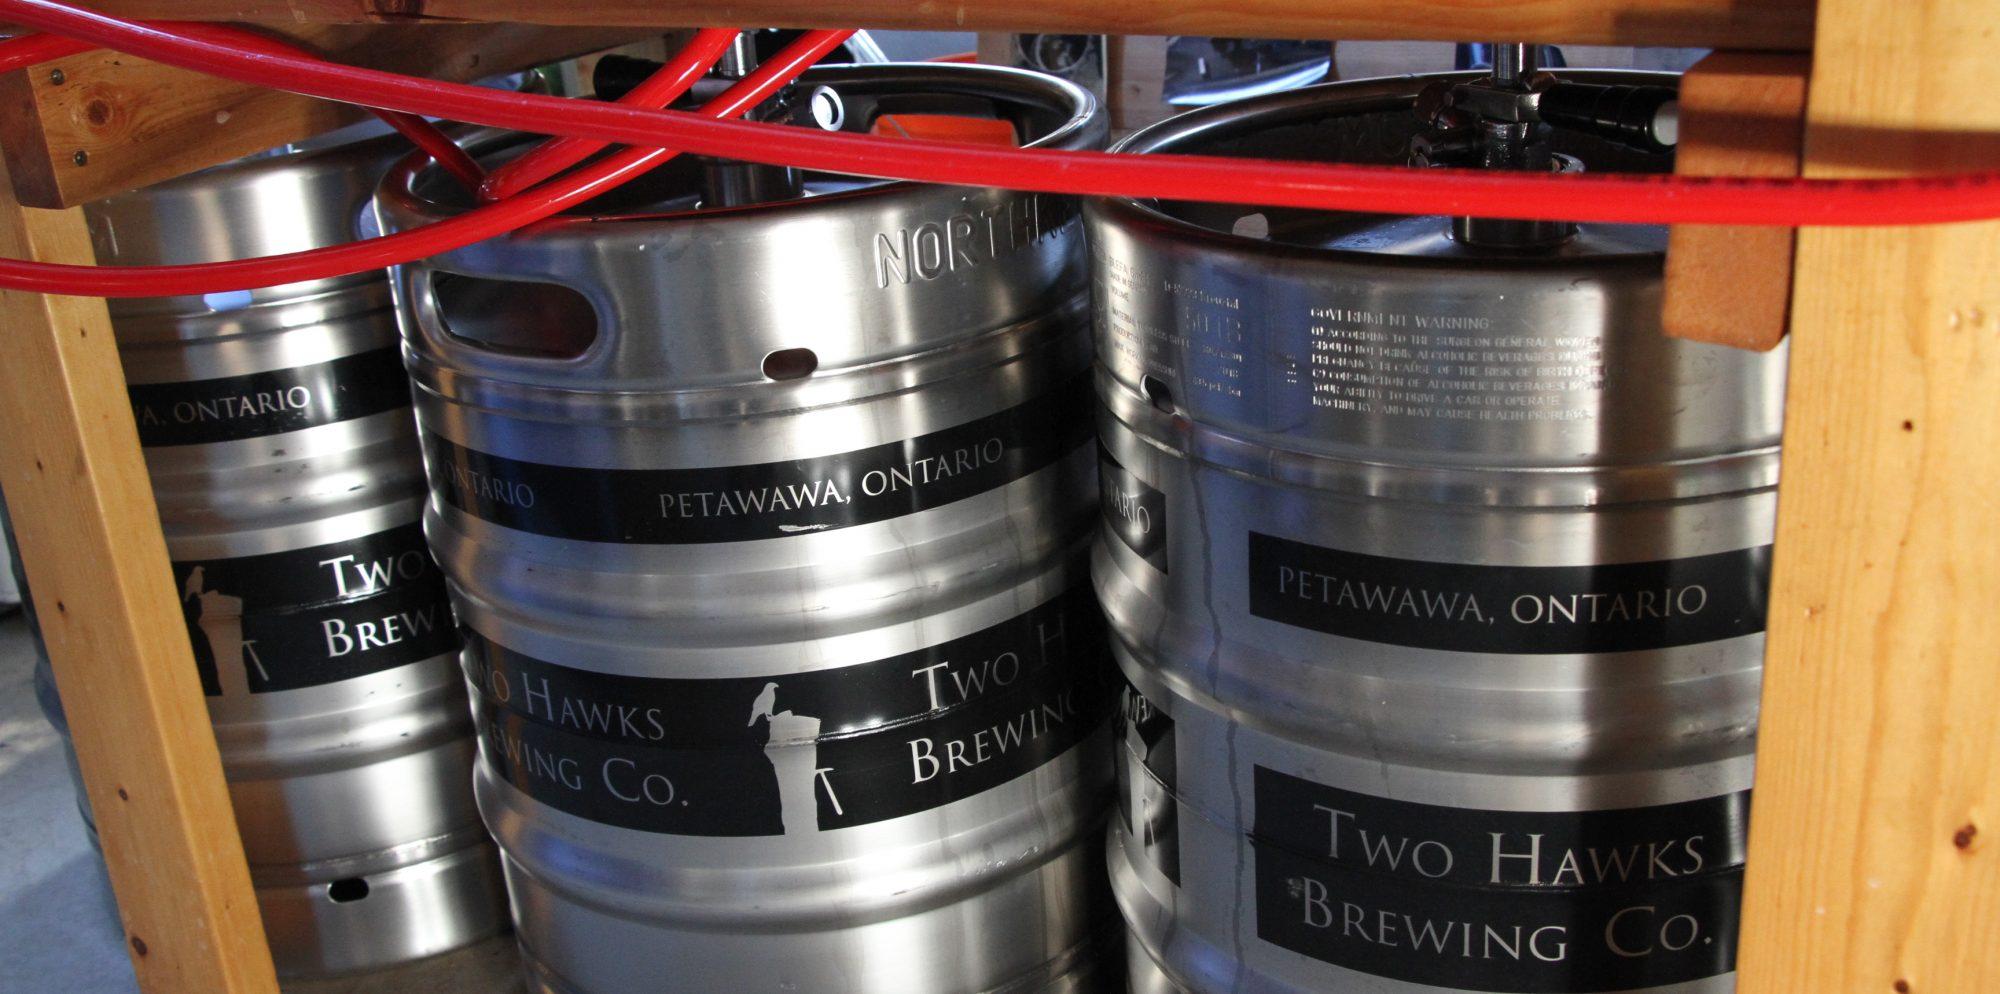 Two Hawks Brewing Co.